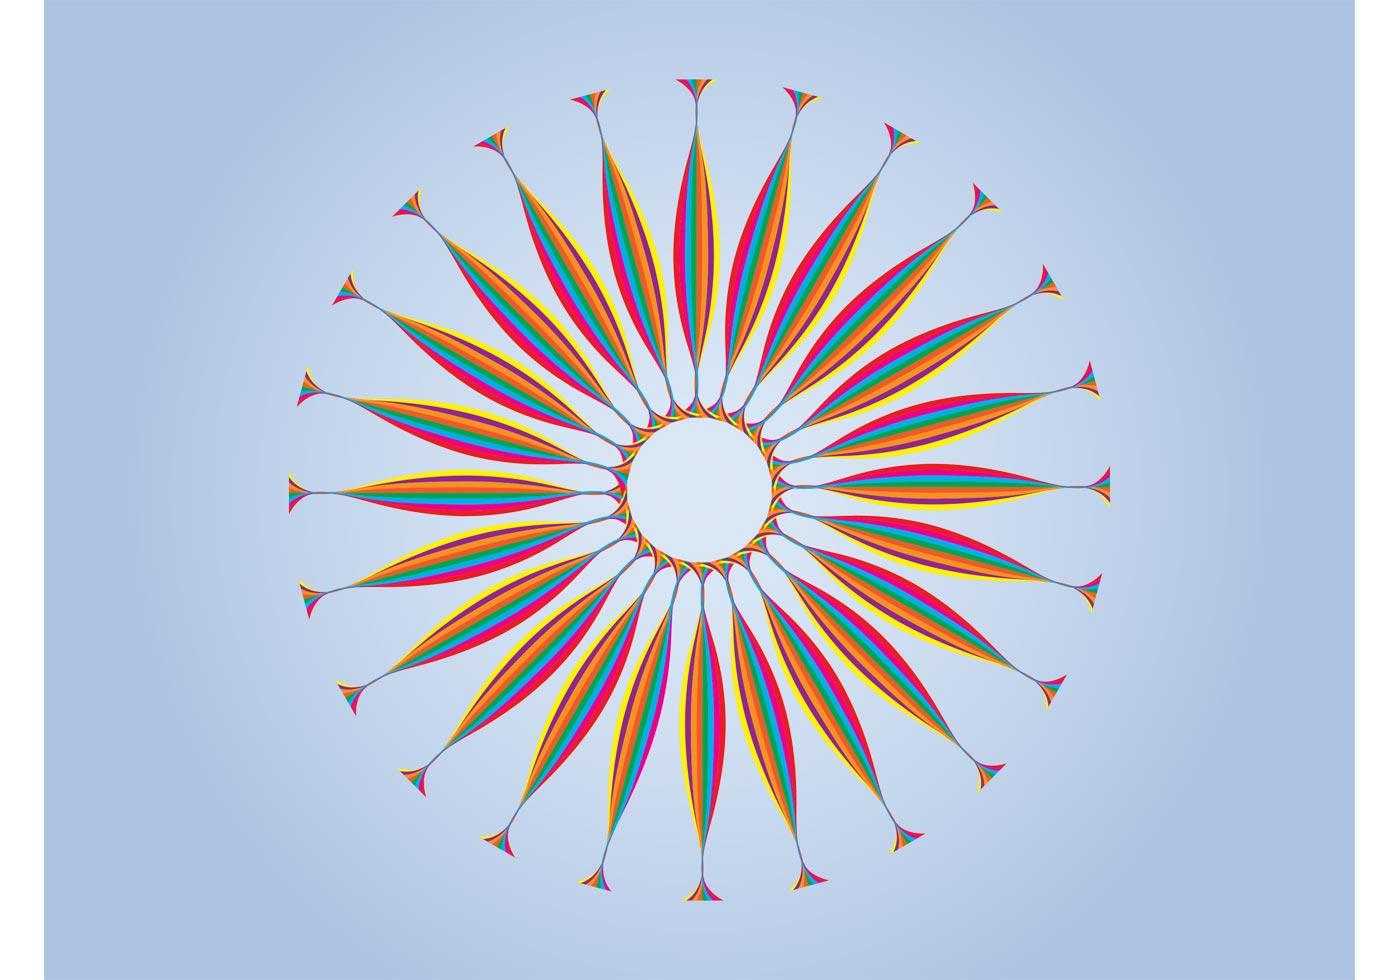 Cute Smiley Wallpapers Rainbow Sun Design Download Free Vector Art Stock